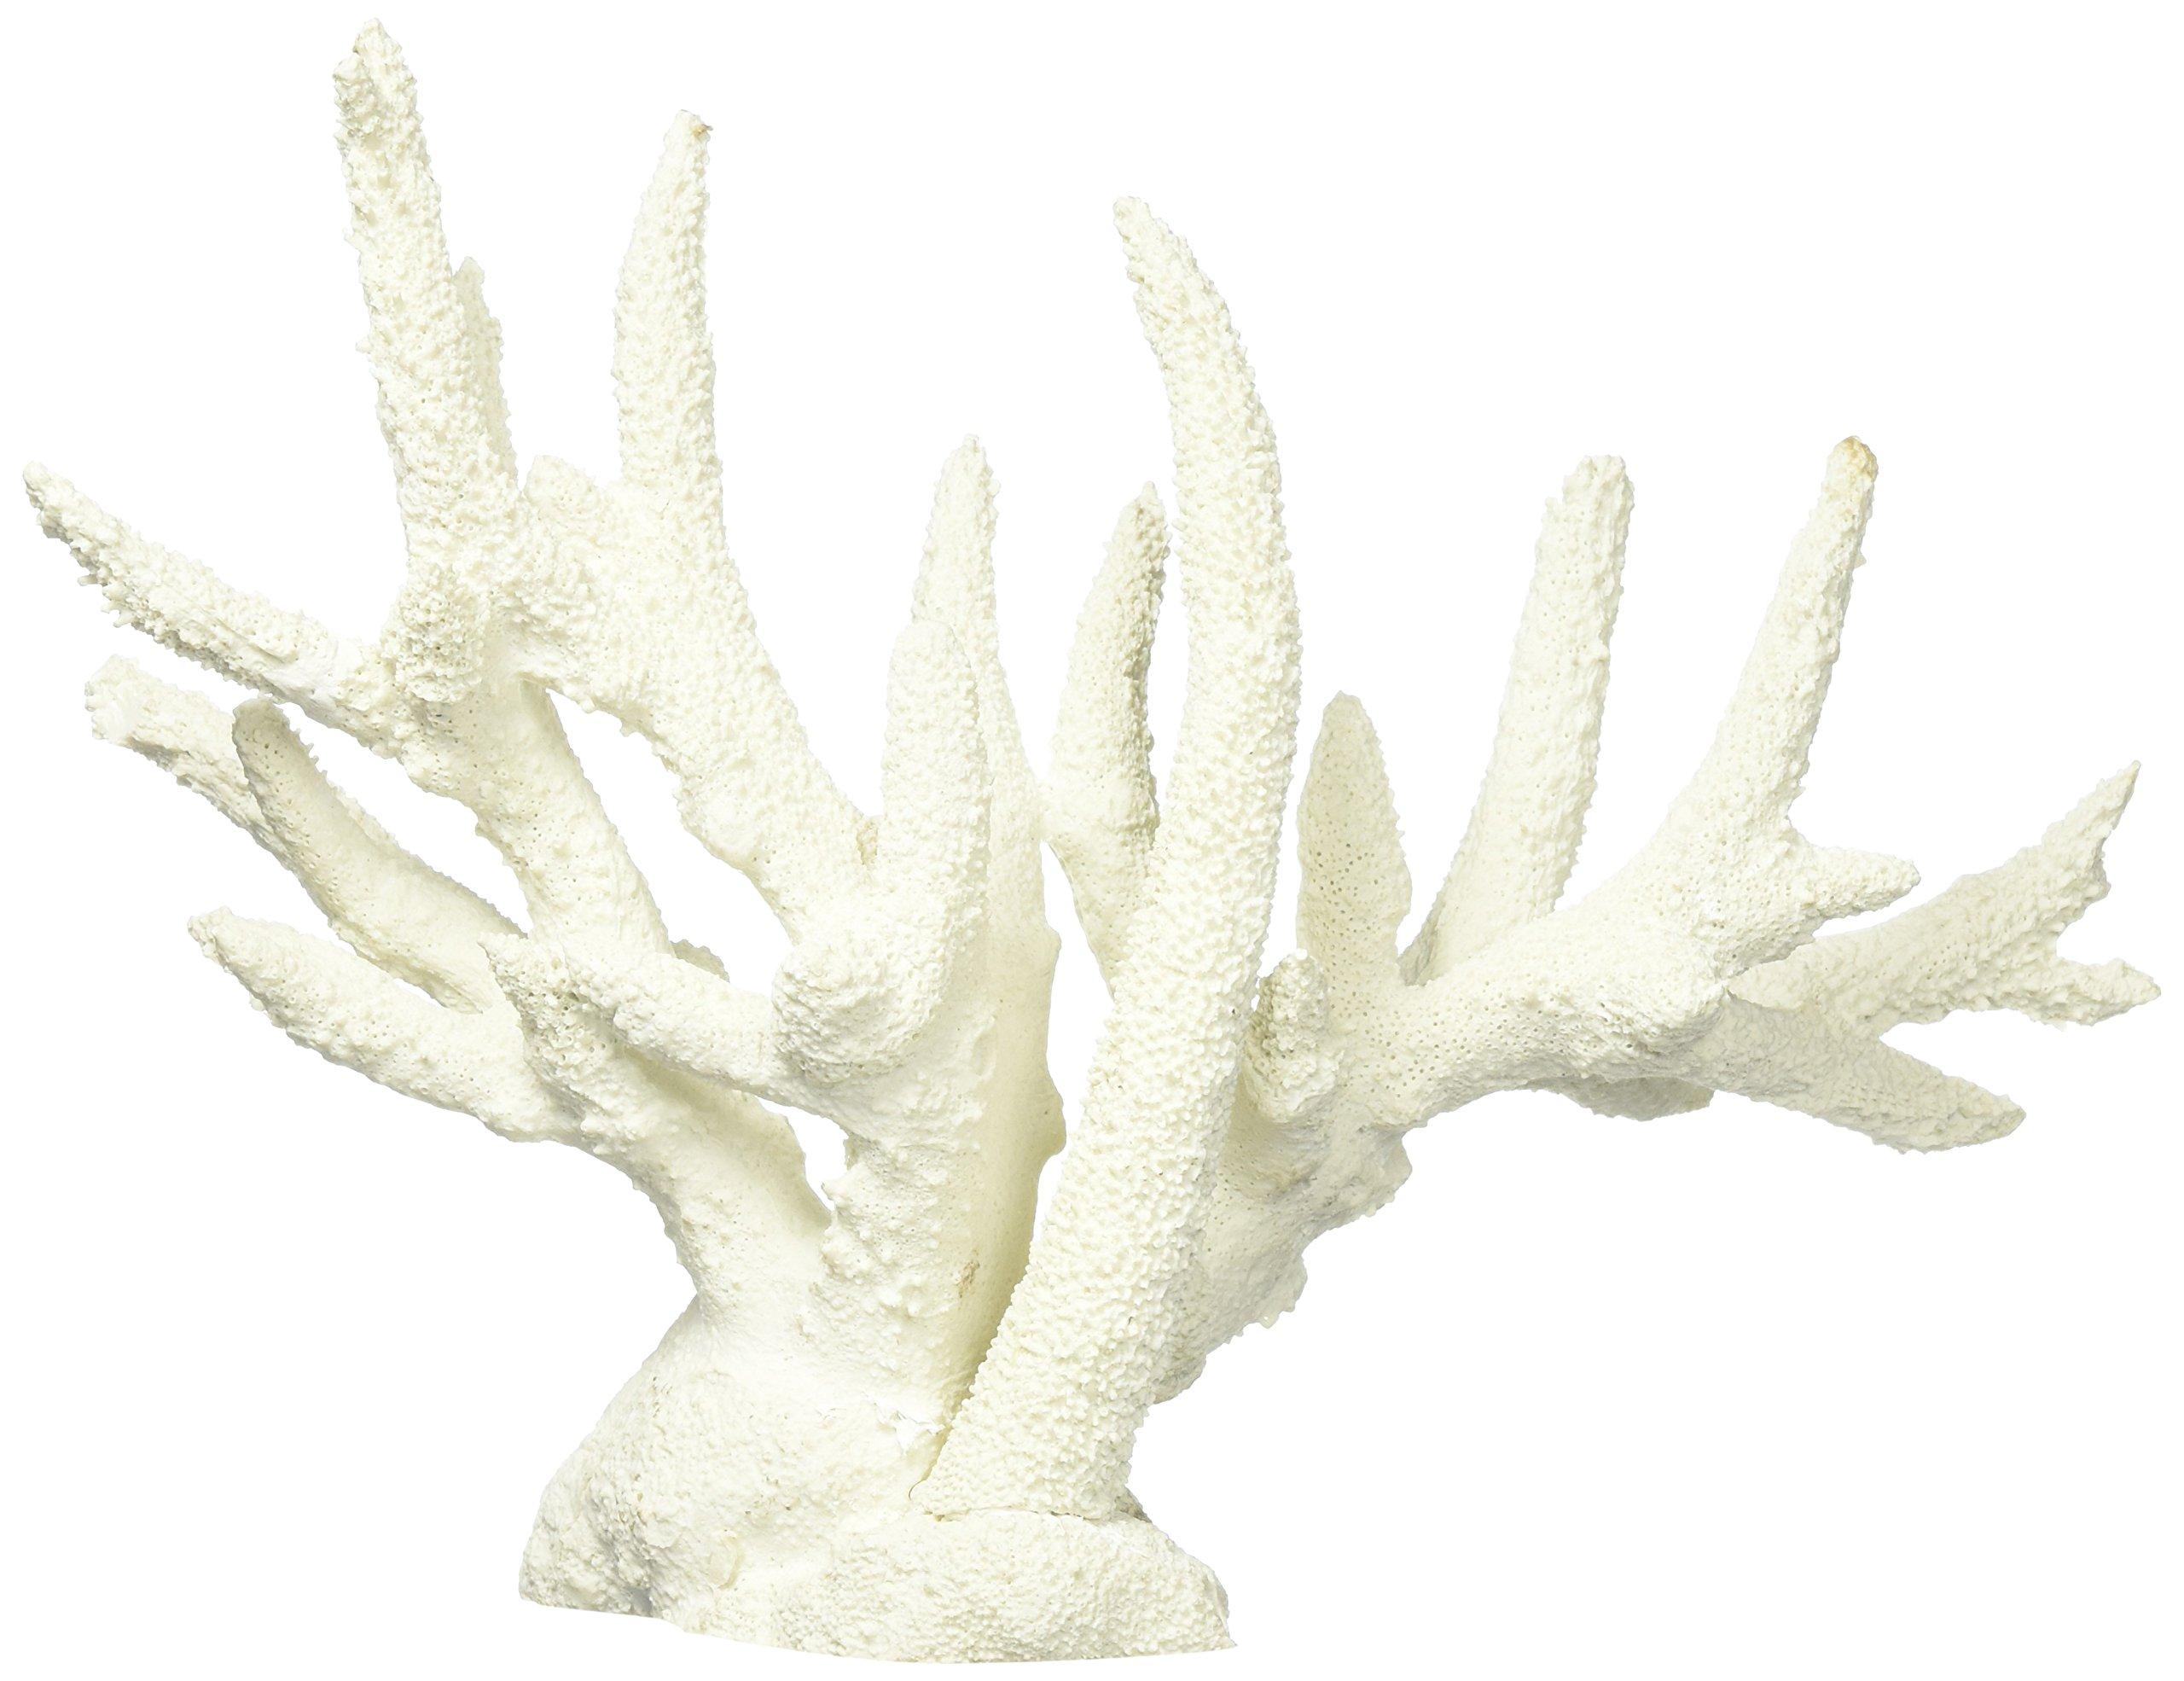 Deep Blue Professional ADB80092 Staghorn Coral for Aquarium, 13.5 by 4.5 by 9.5-Inch